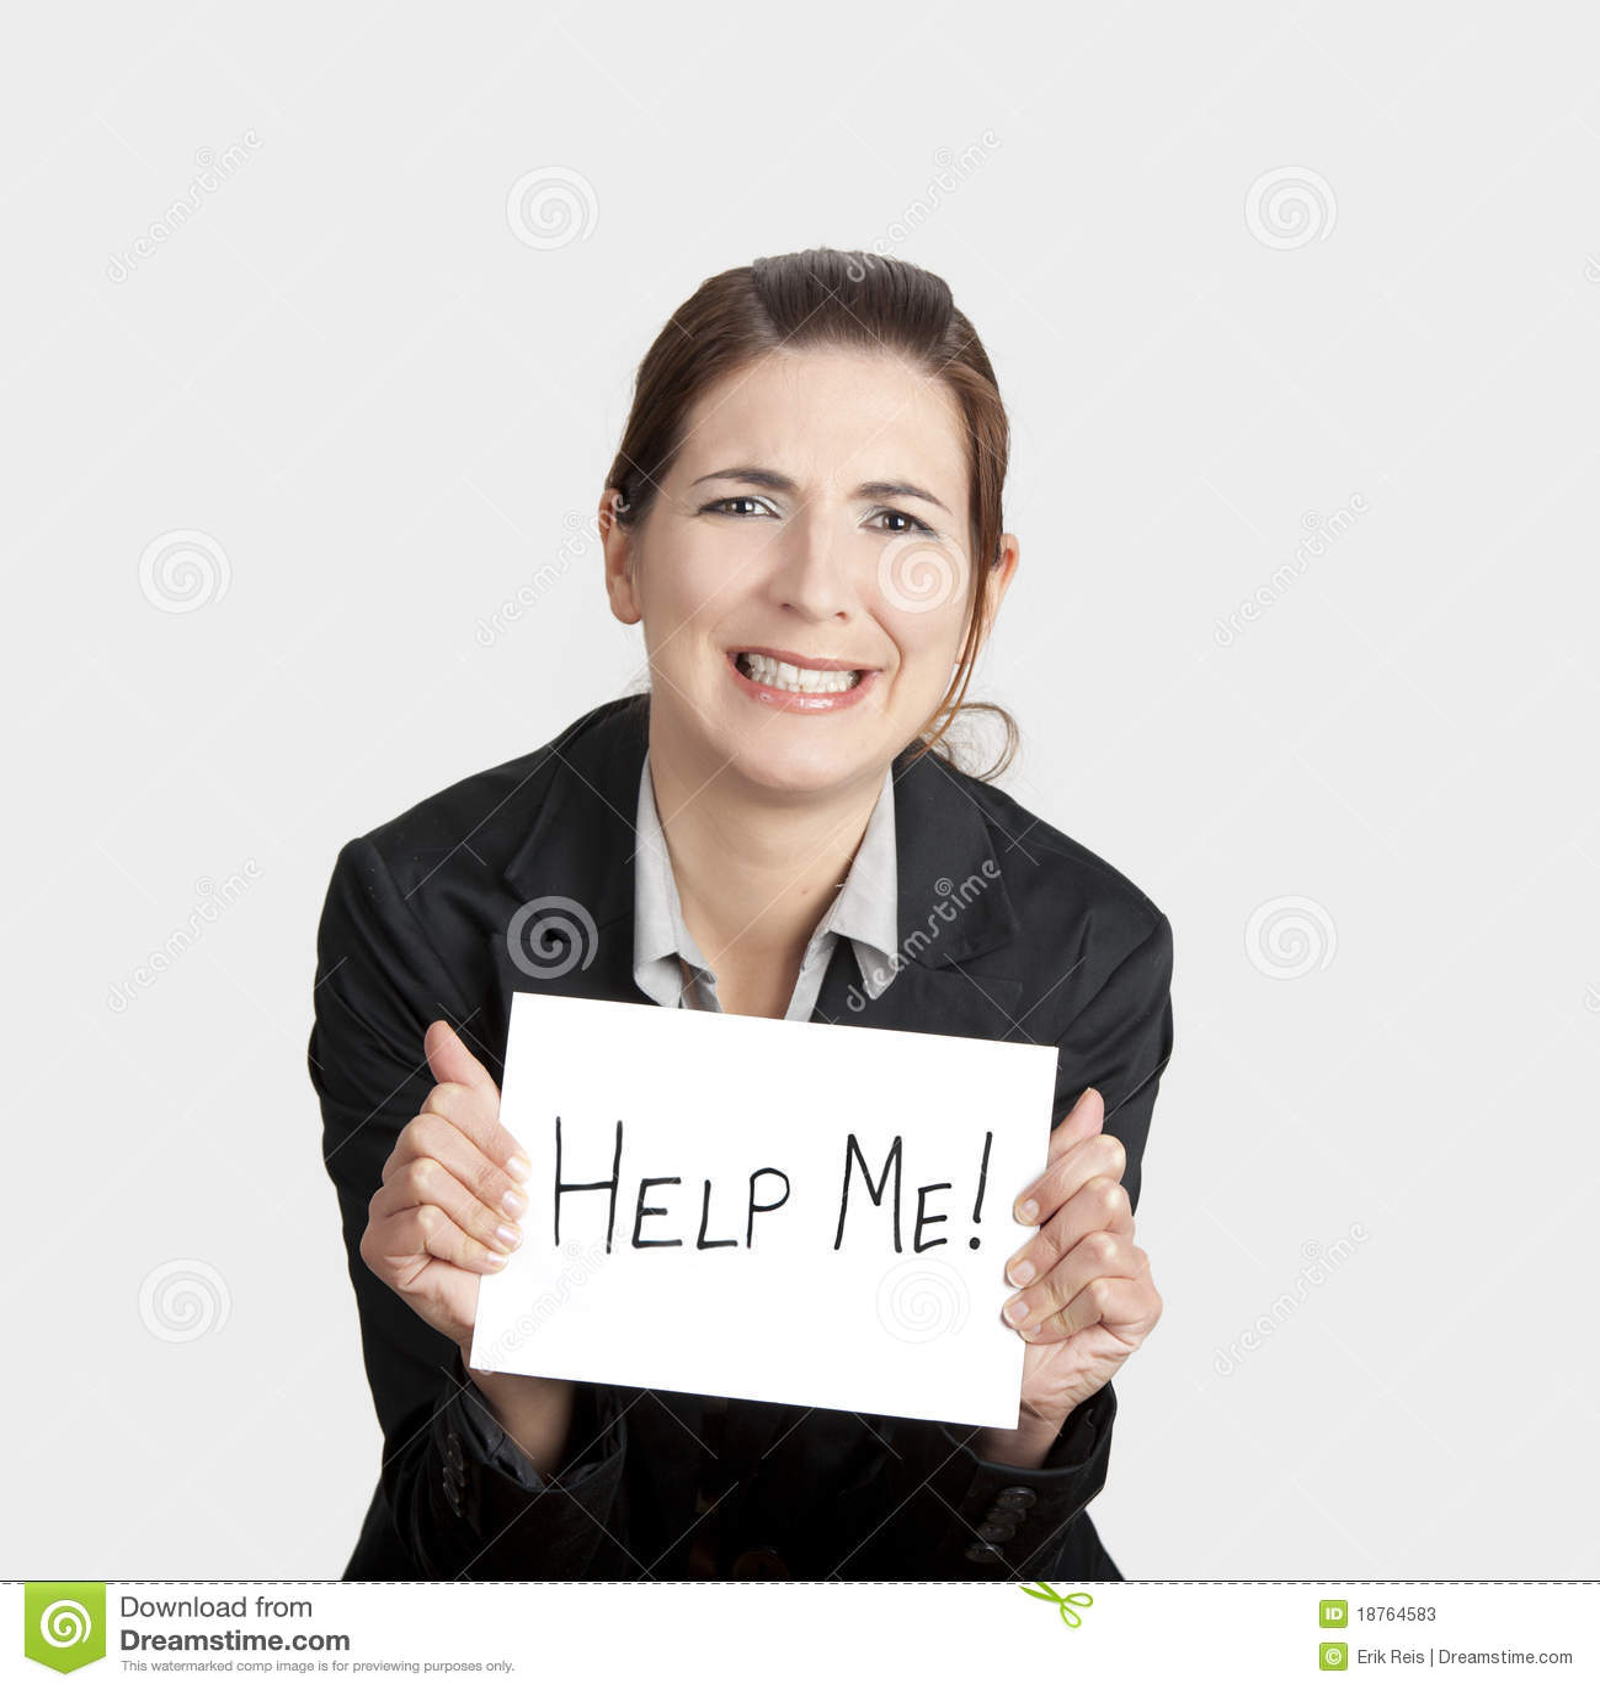 Please help me !!!!!?